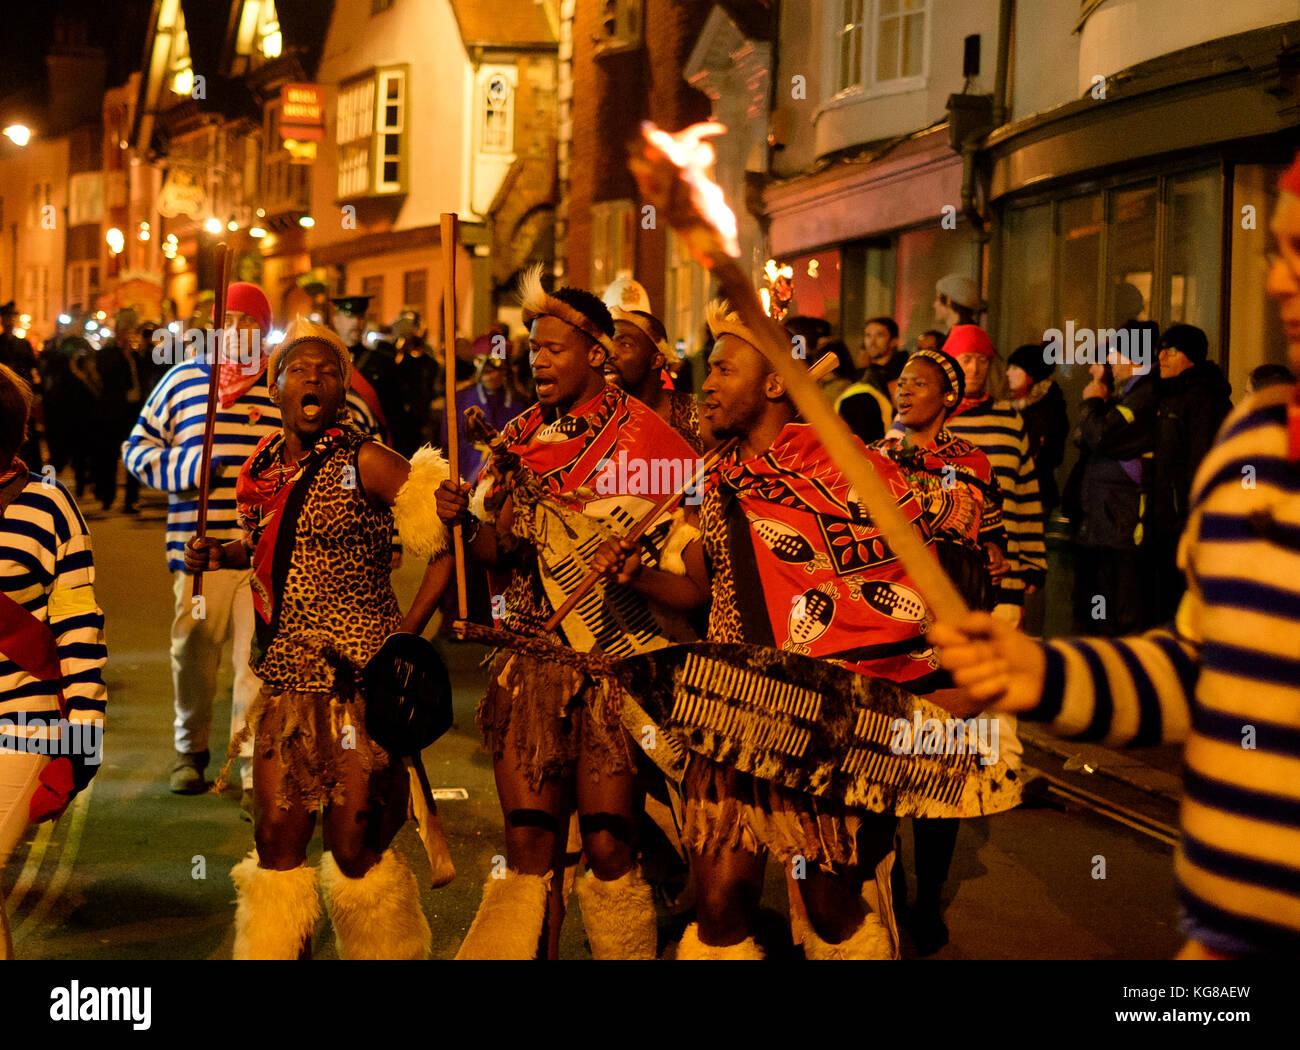 Lewes, UK - 4 November 2017:  Participants from Borough Bonfire Society at the 2017 Lewes Bonfire night, wearing - Stock Image